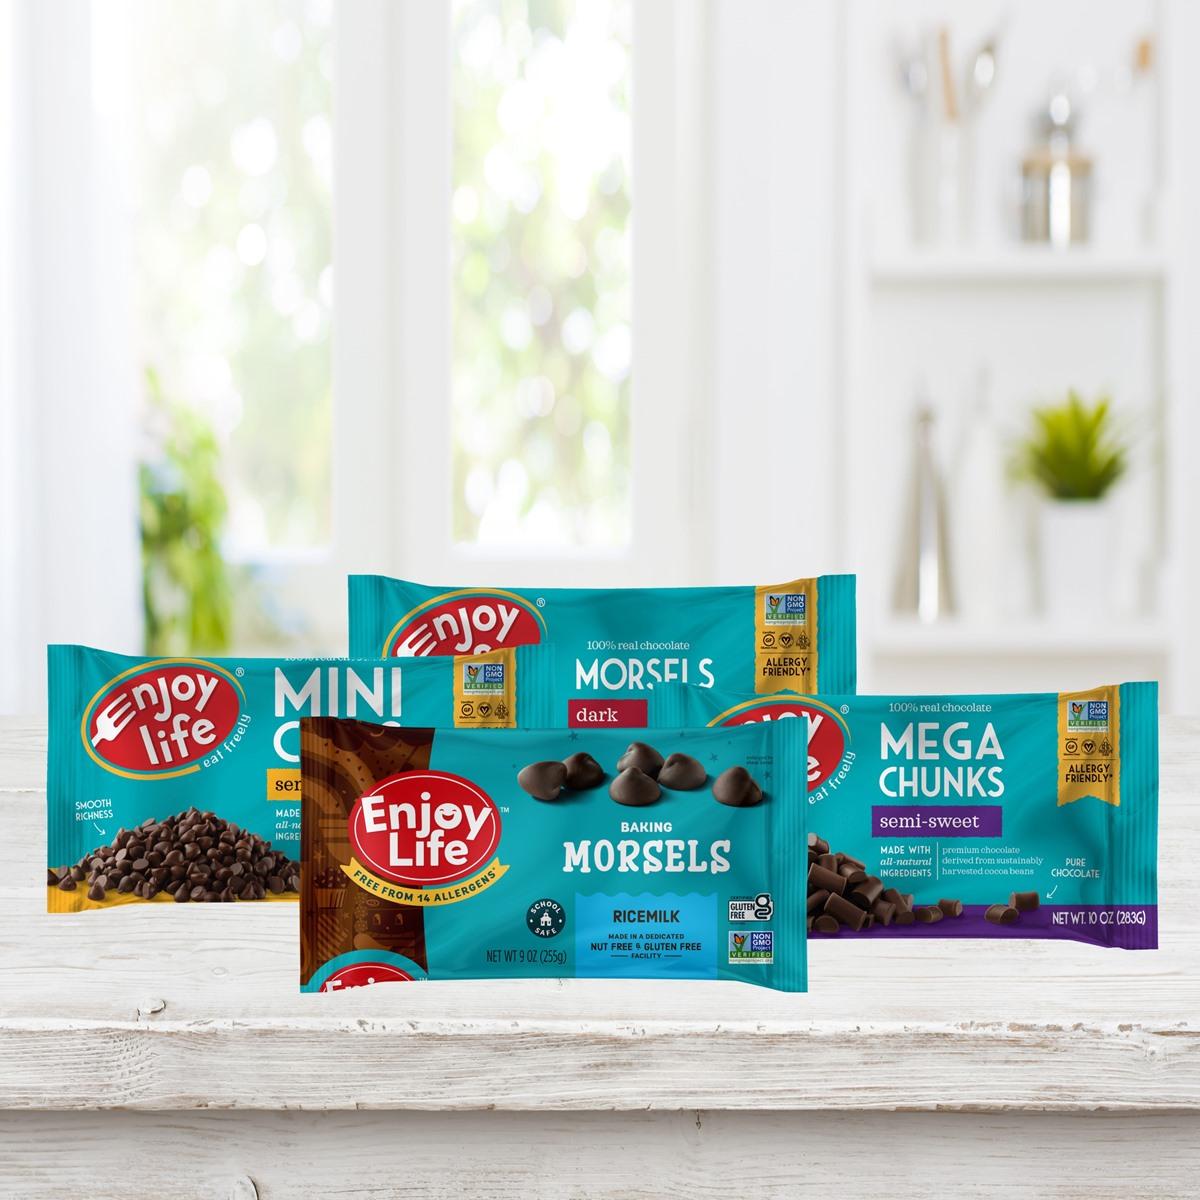 Enjoy Life Chocolate Chips Now in Dark, Semi-Sweet, and Rich Ricemilk - Top Allergen-Free, Vegan, and Gluten-Free!